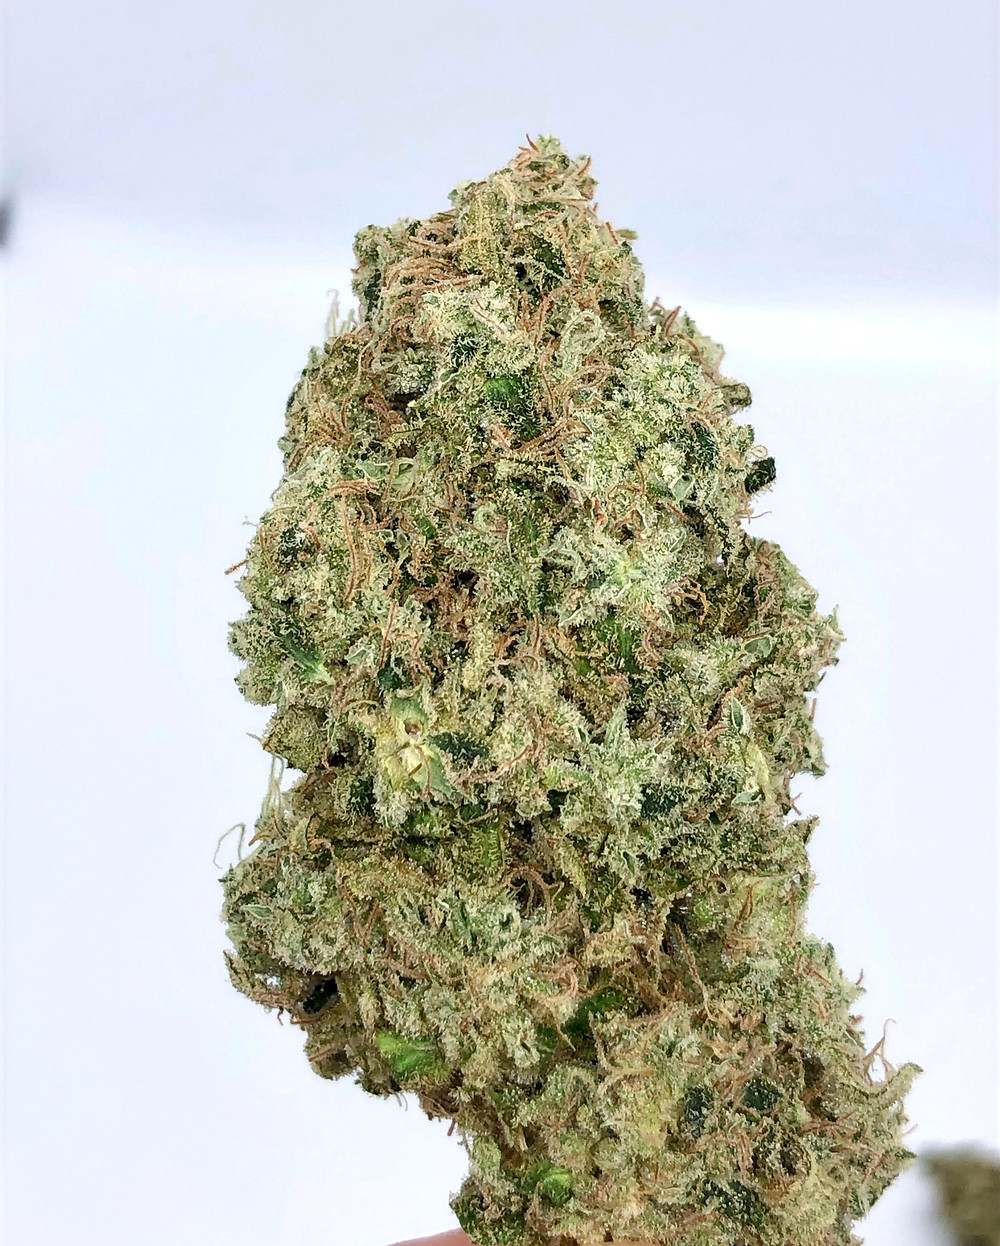 lemon-skunk-herbal-alternatives-dc-review